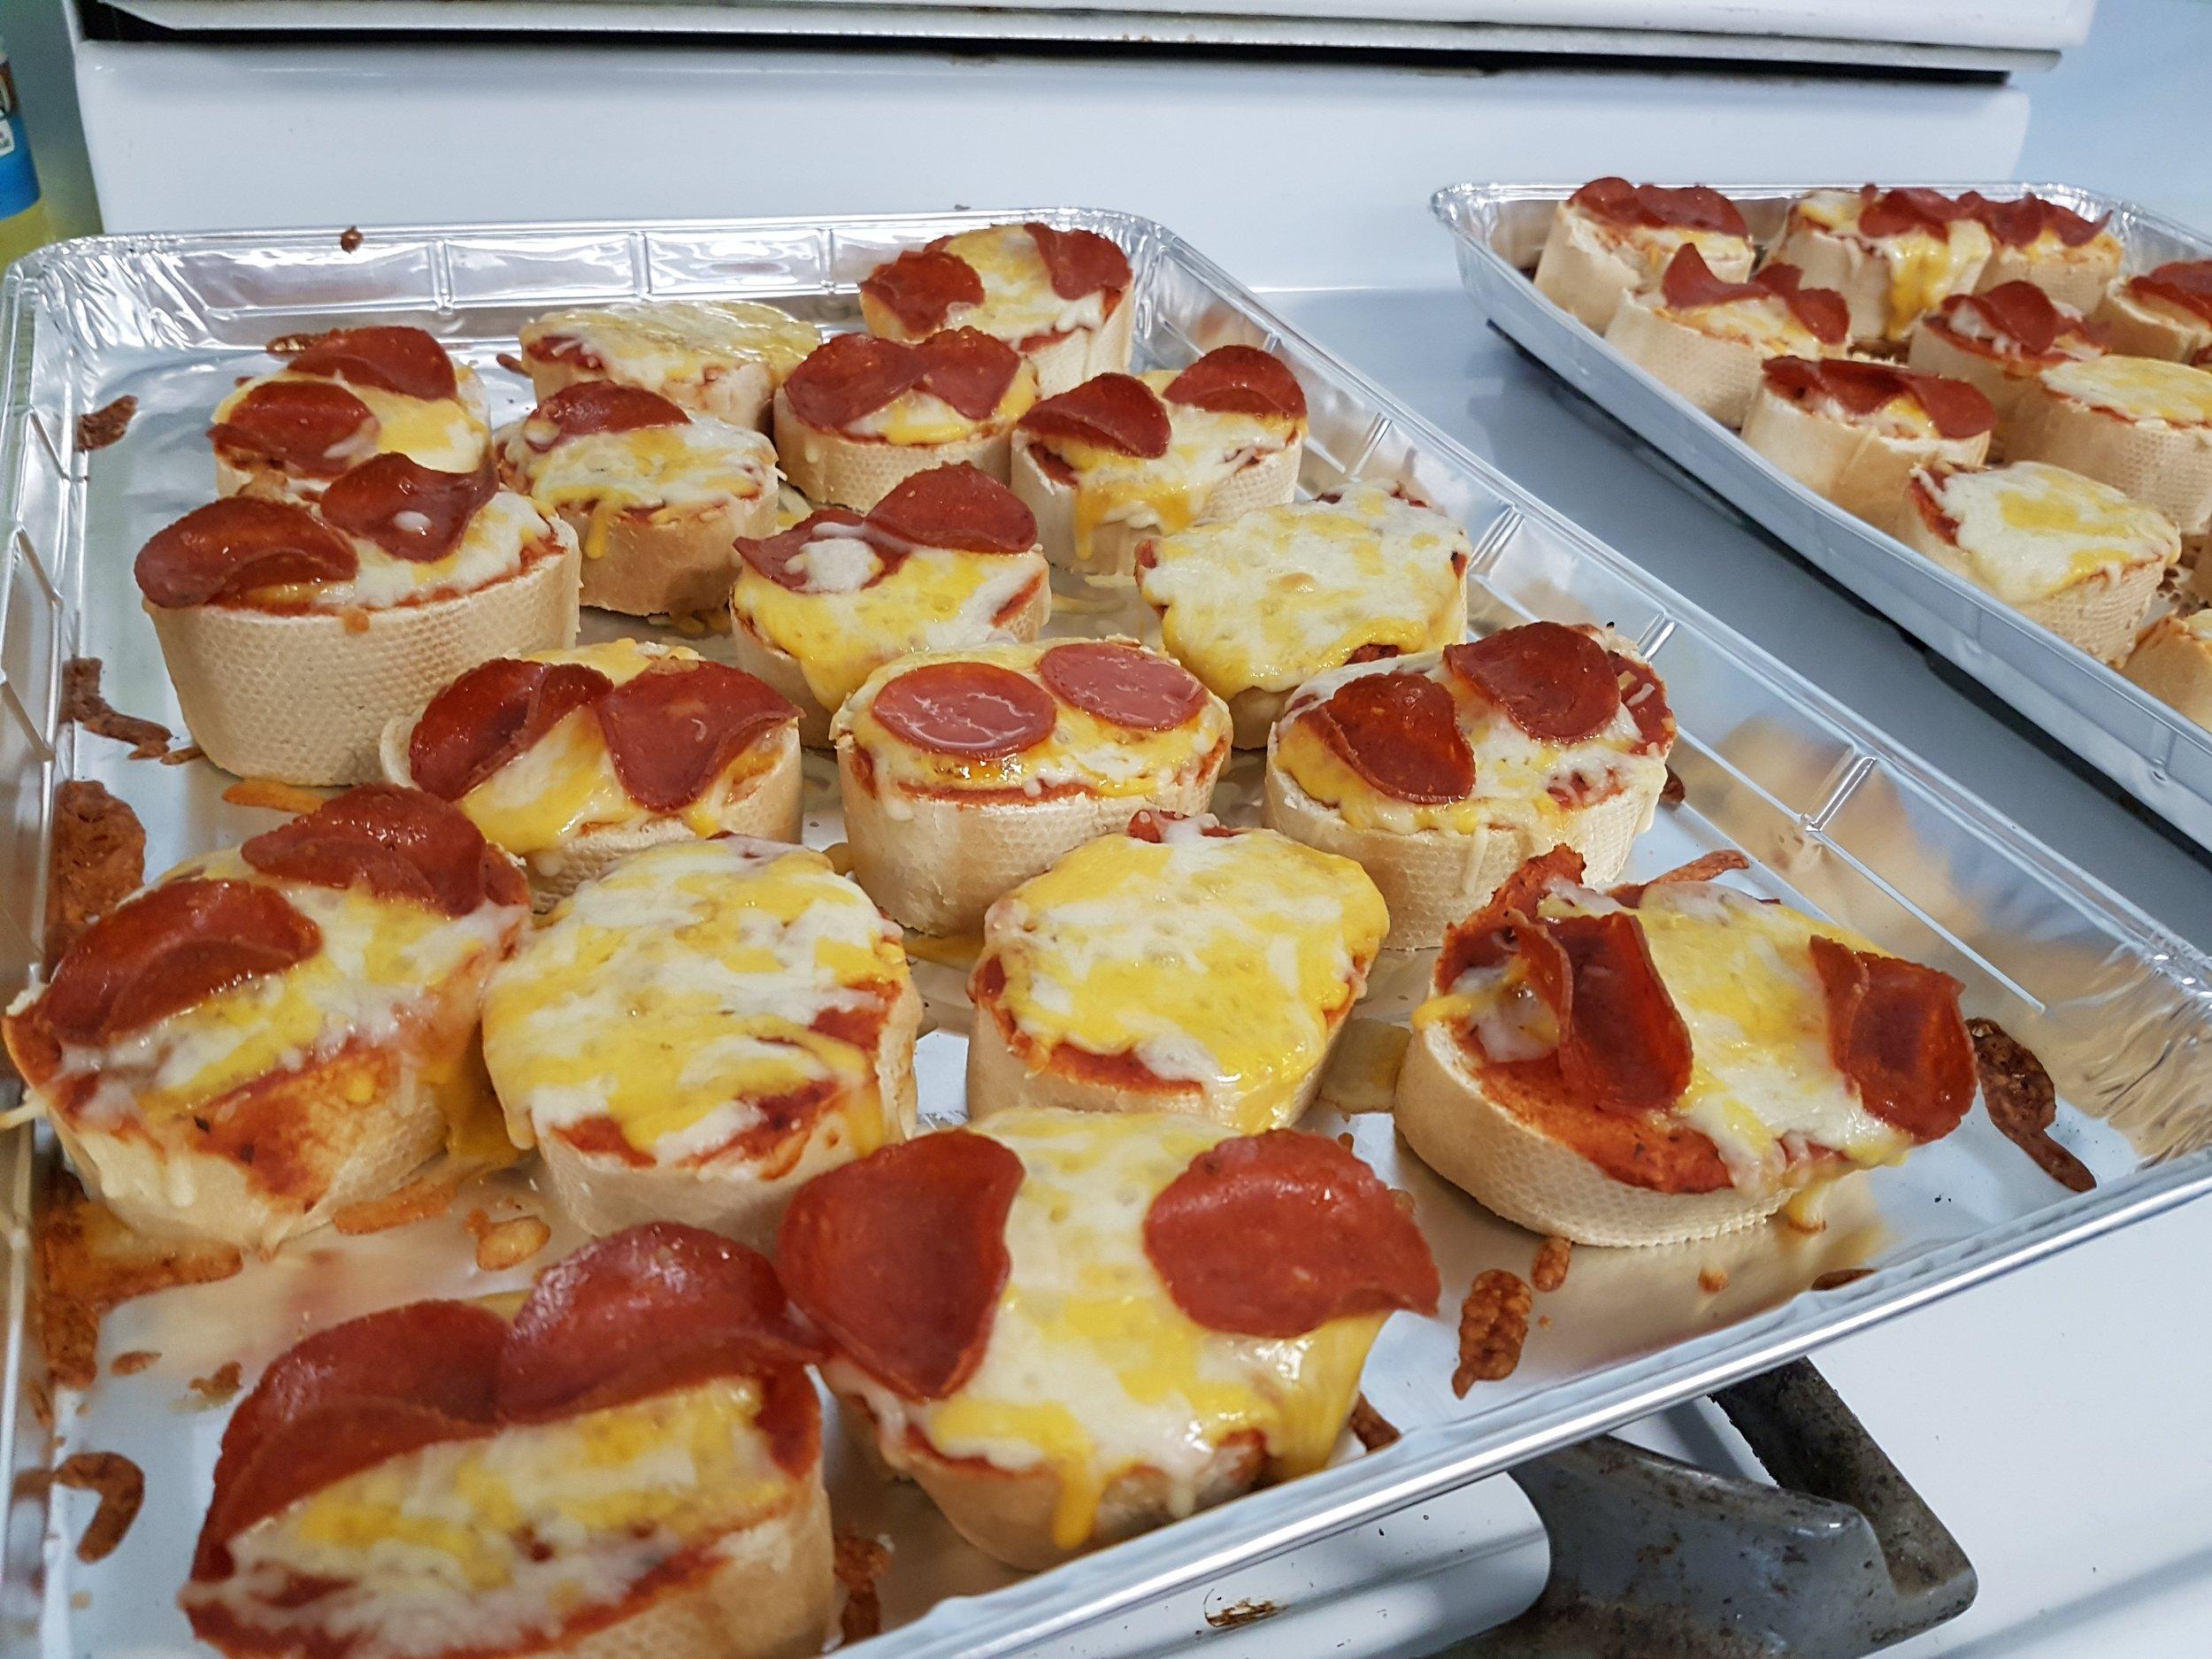 French Bread pizza.jpg